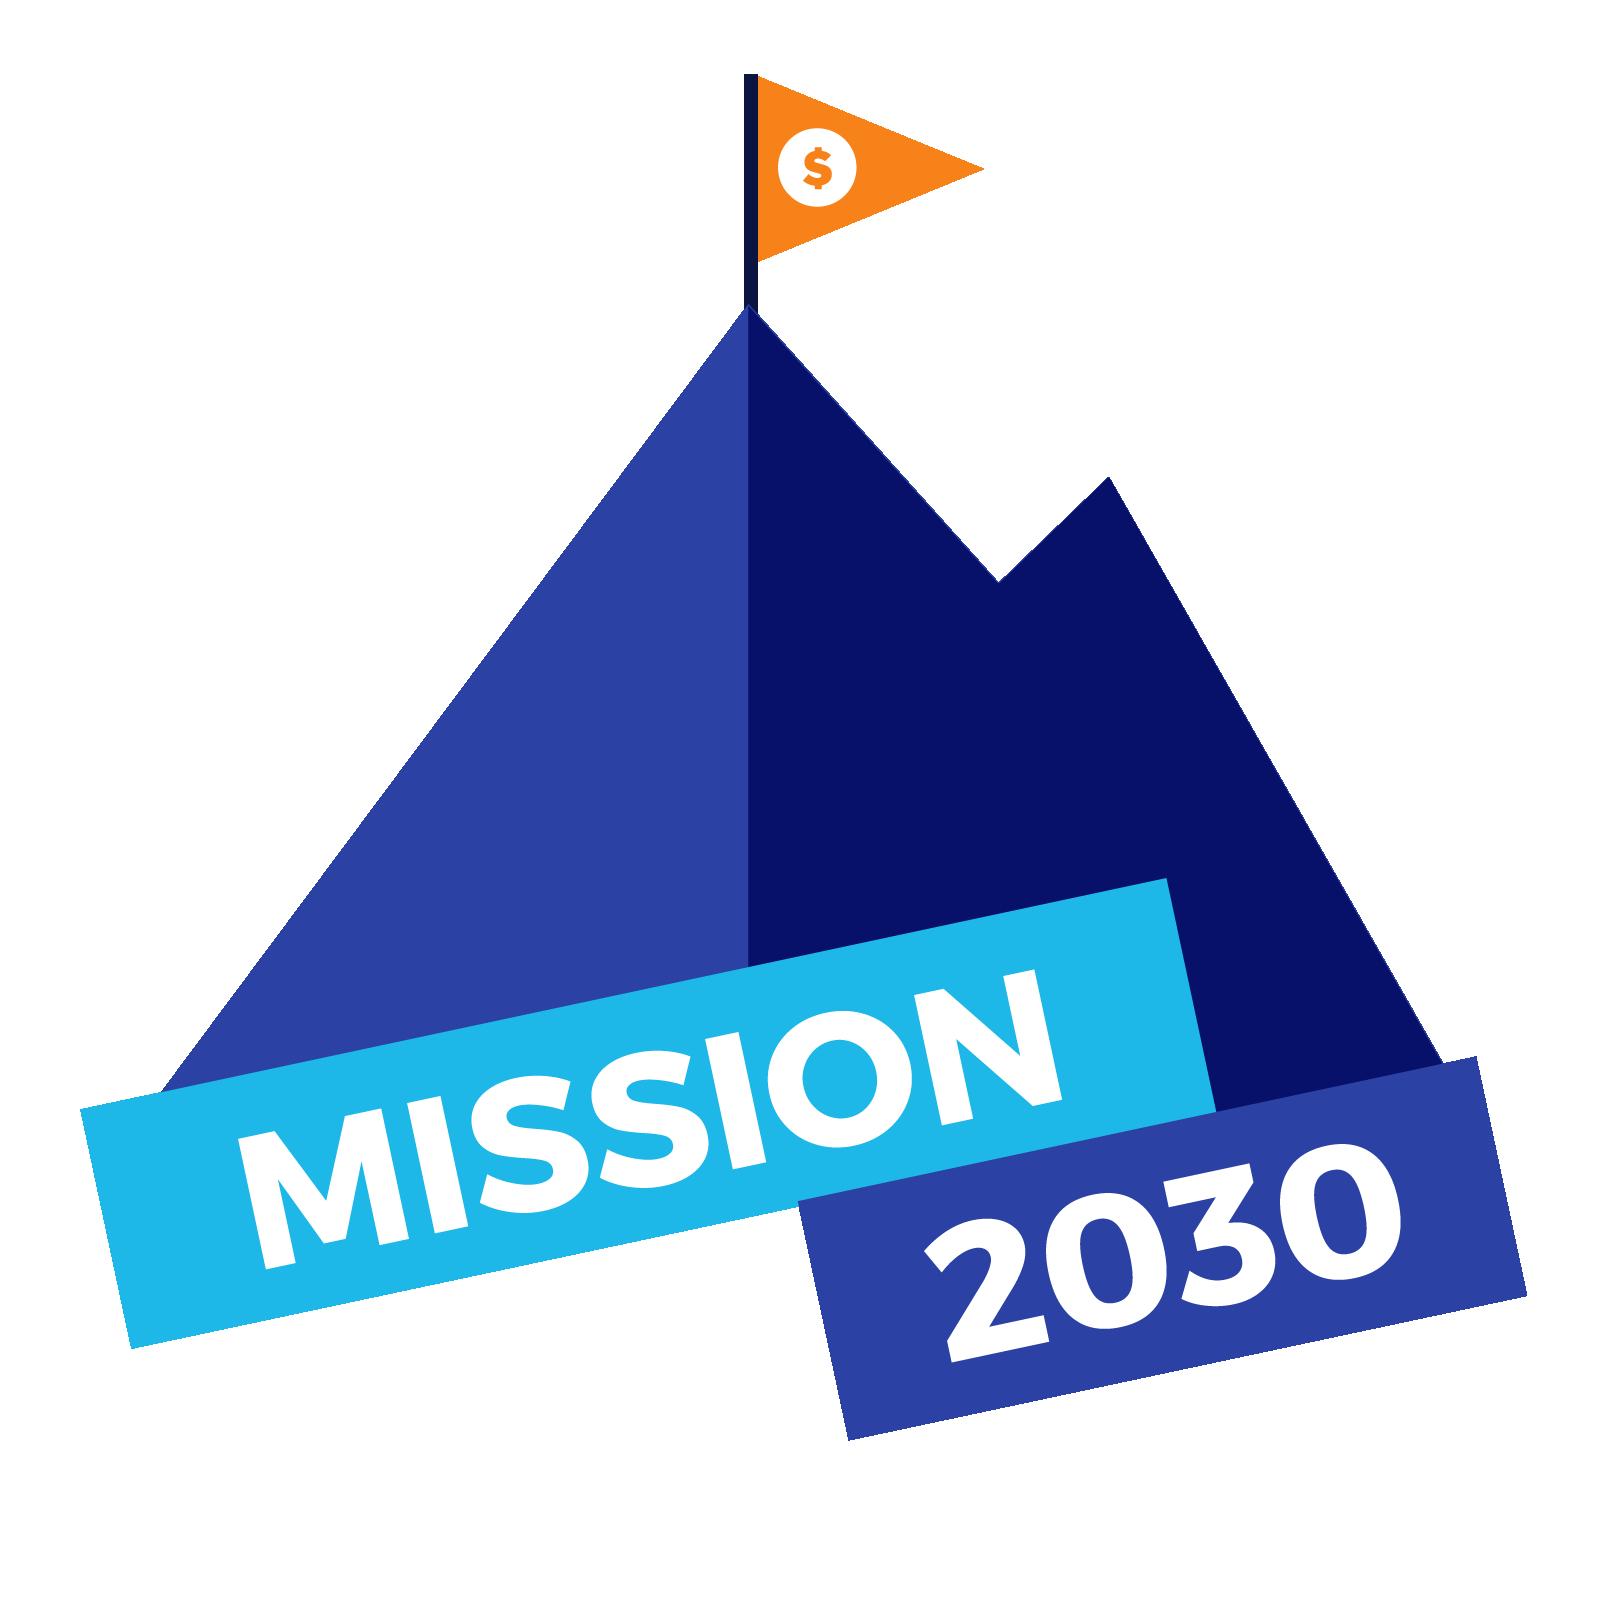 NGPF Mission 2030 Logo